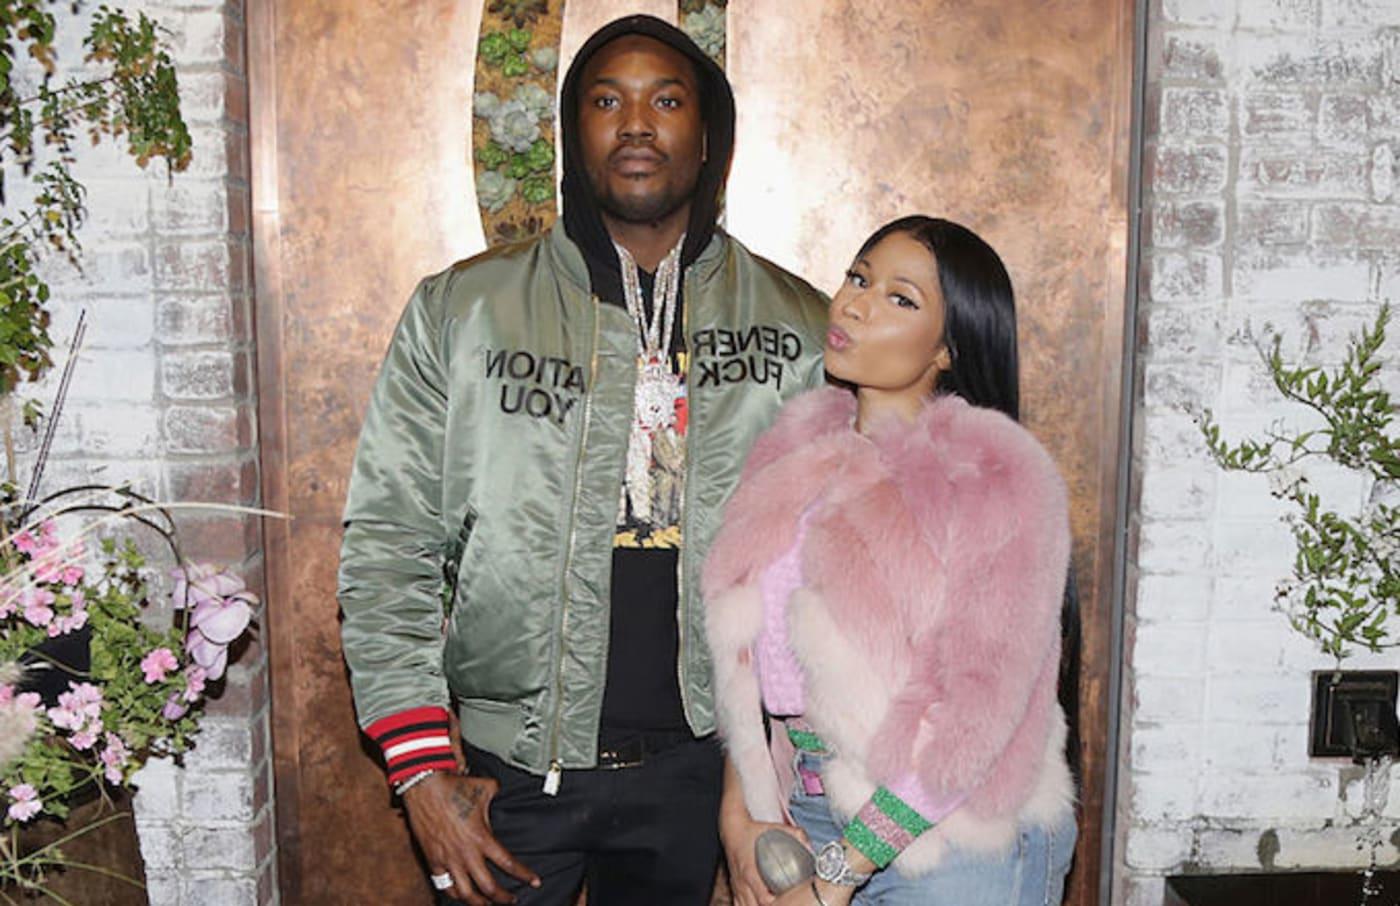 Meek Mill, Nicki Minaj social media